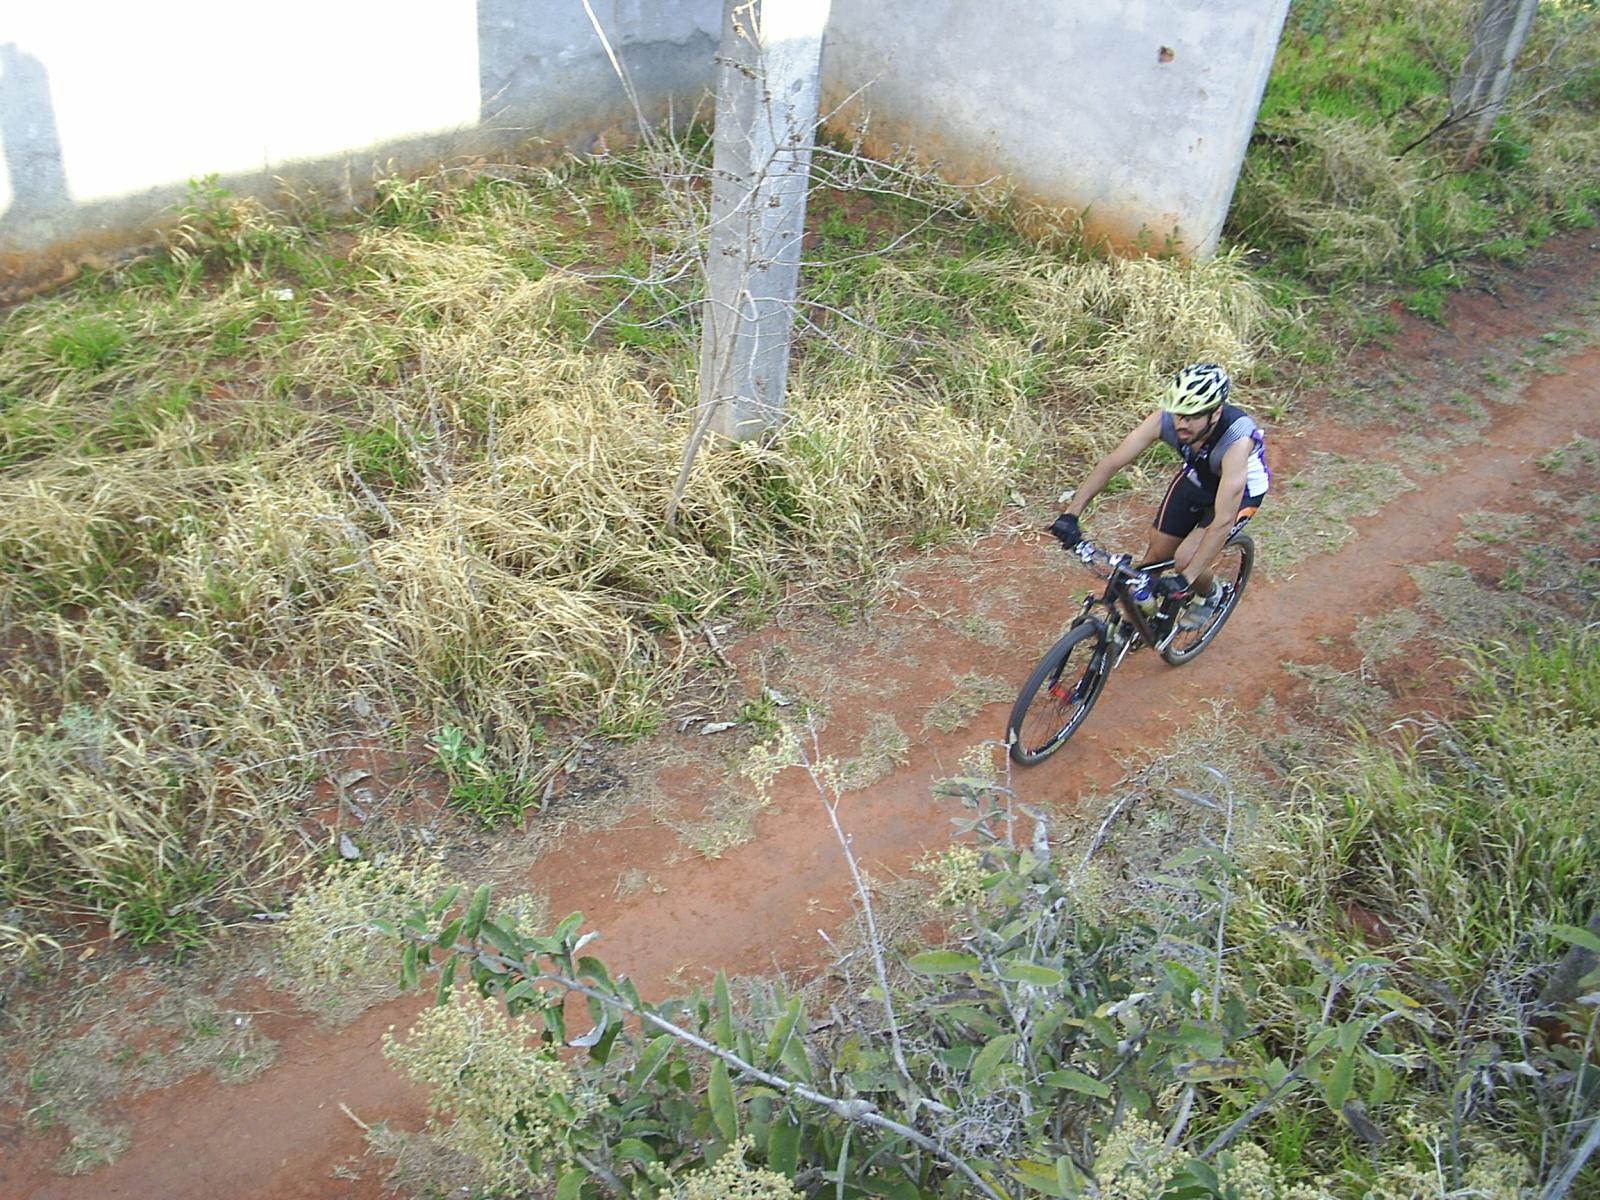 Circuito Xco : Passos mountain bike circuito xco